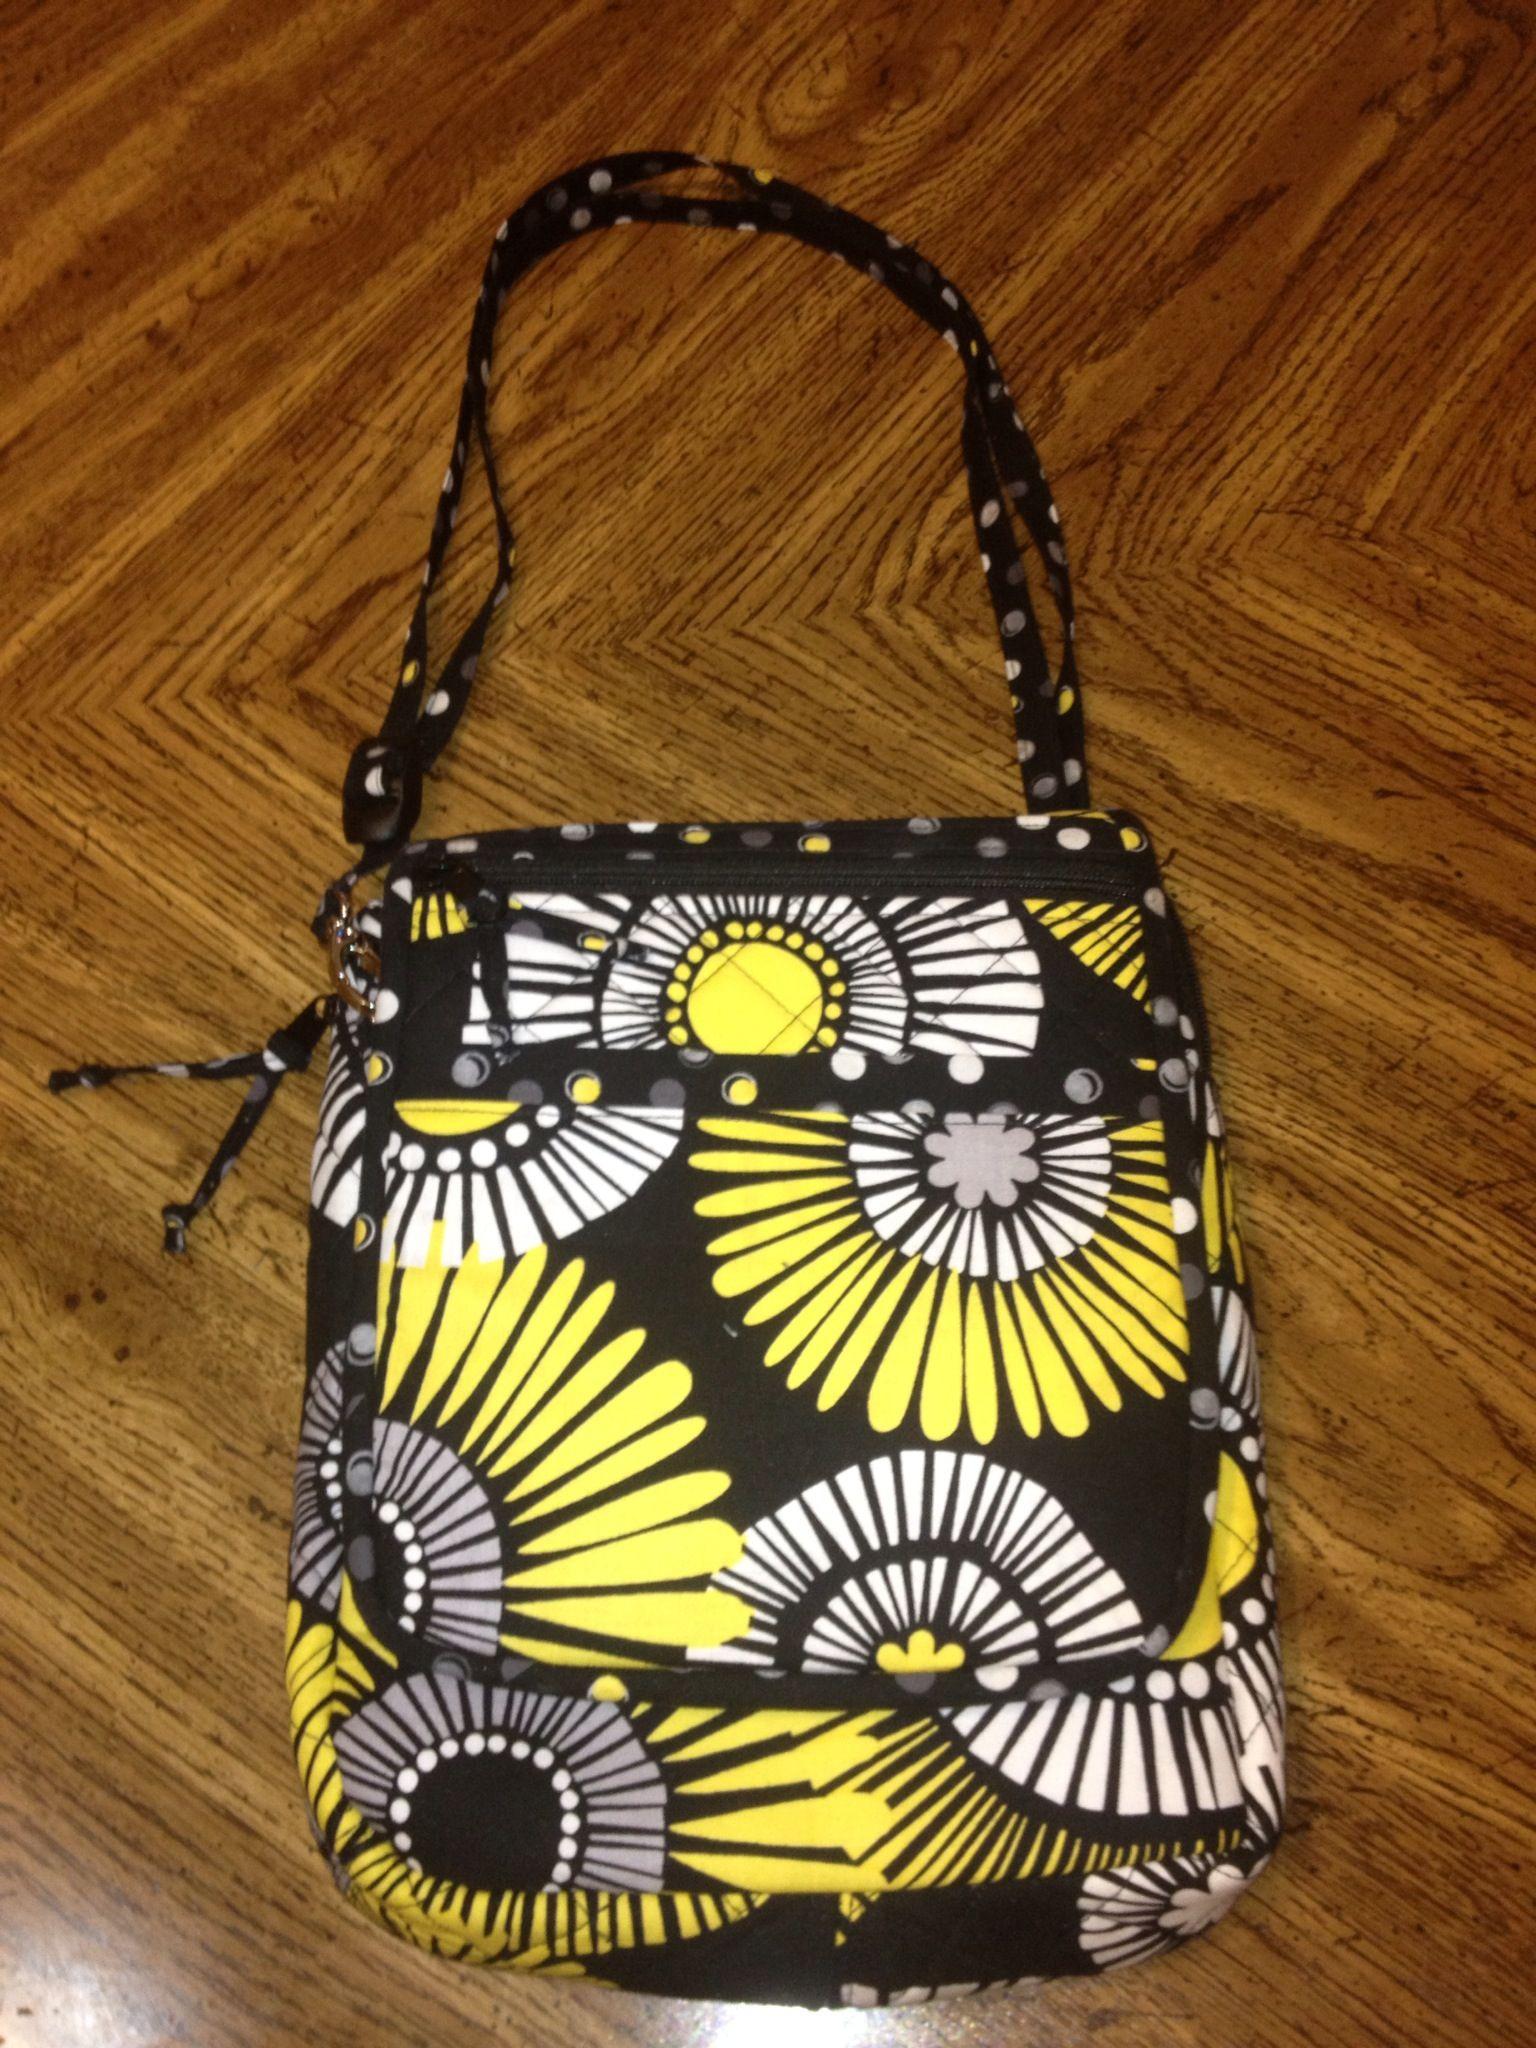 This is an IPad bag I made.   Ipad bag, Bags, Diy and ...